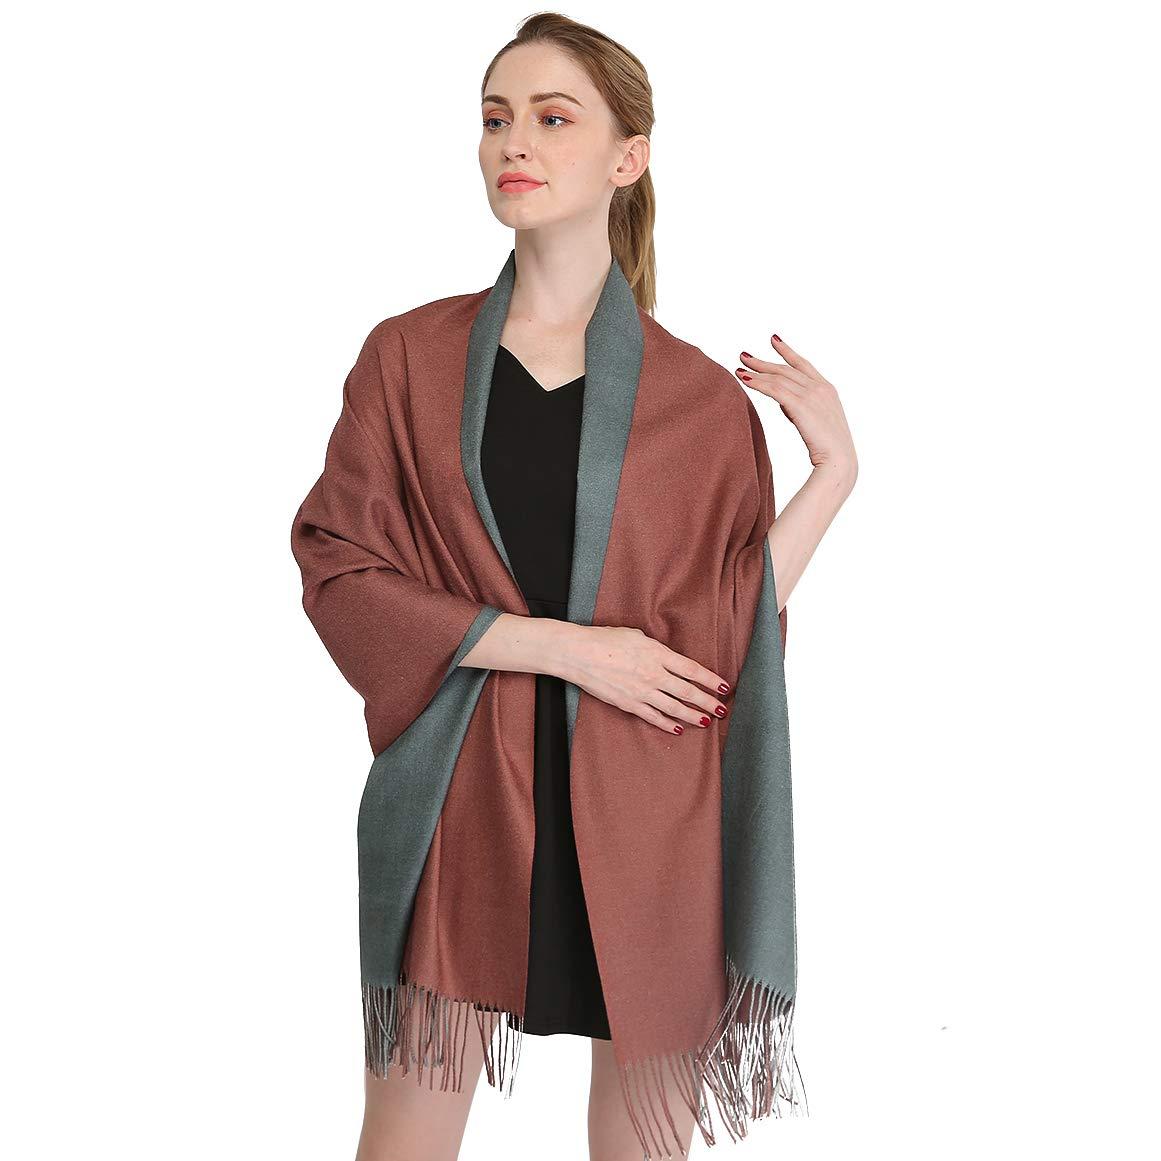 Longwu Cashmere Wrap Shole Chal para Mujer Invierno Extra Grande (79″X 28″) Hombres Pañuelo de Pashmina Sólido de Lana de Cordero